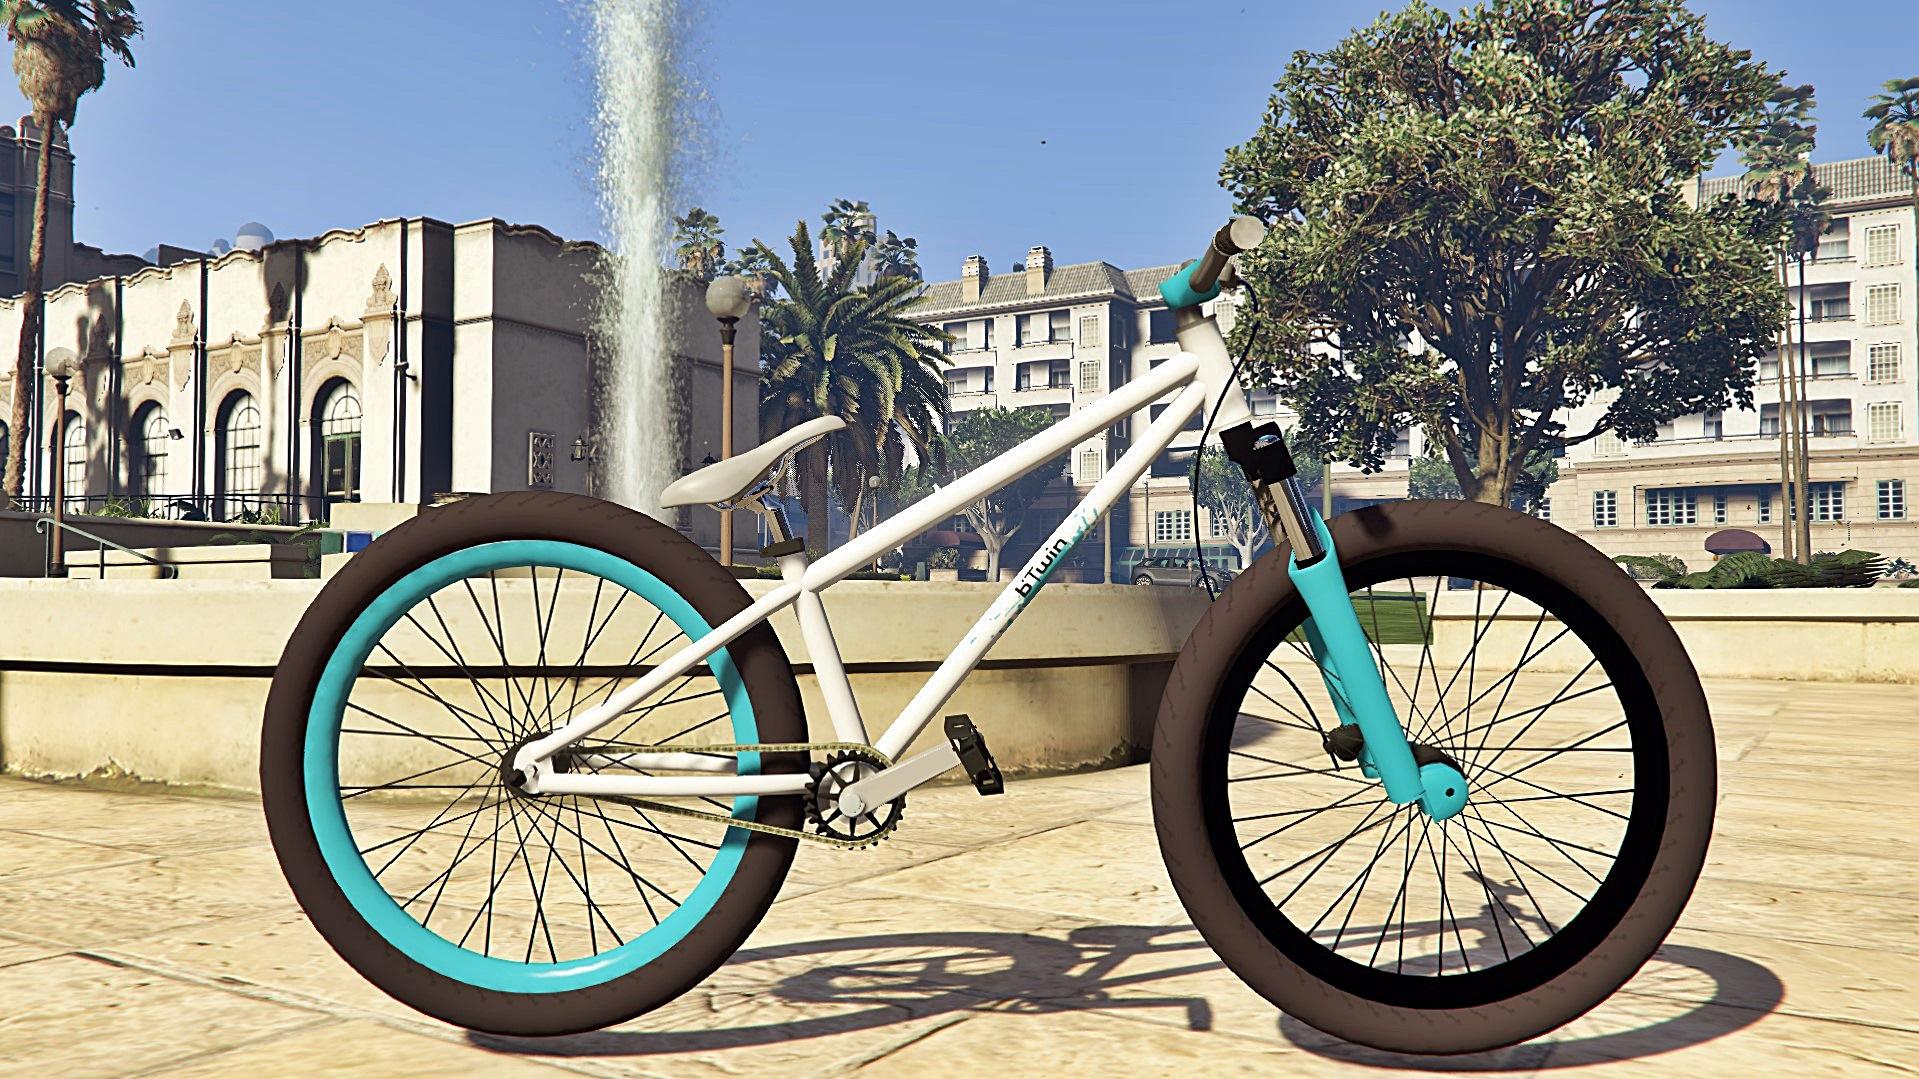 MTB Dirt Bike - BTwin [Add-On / Replace] - GTA5-Mods.com